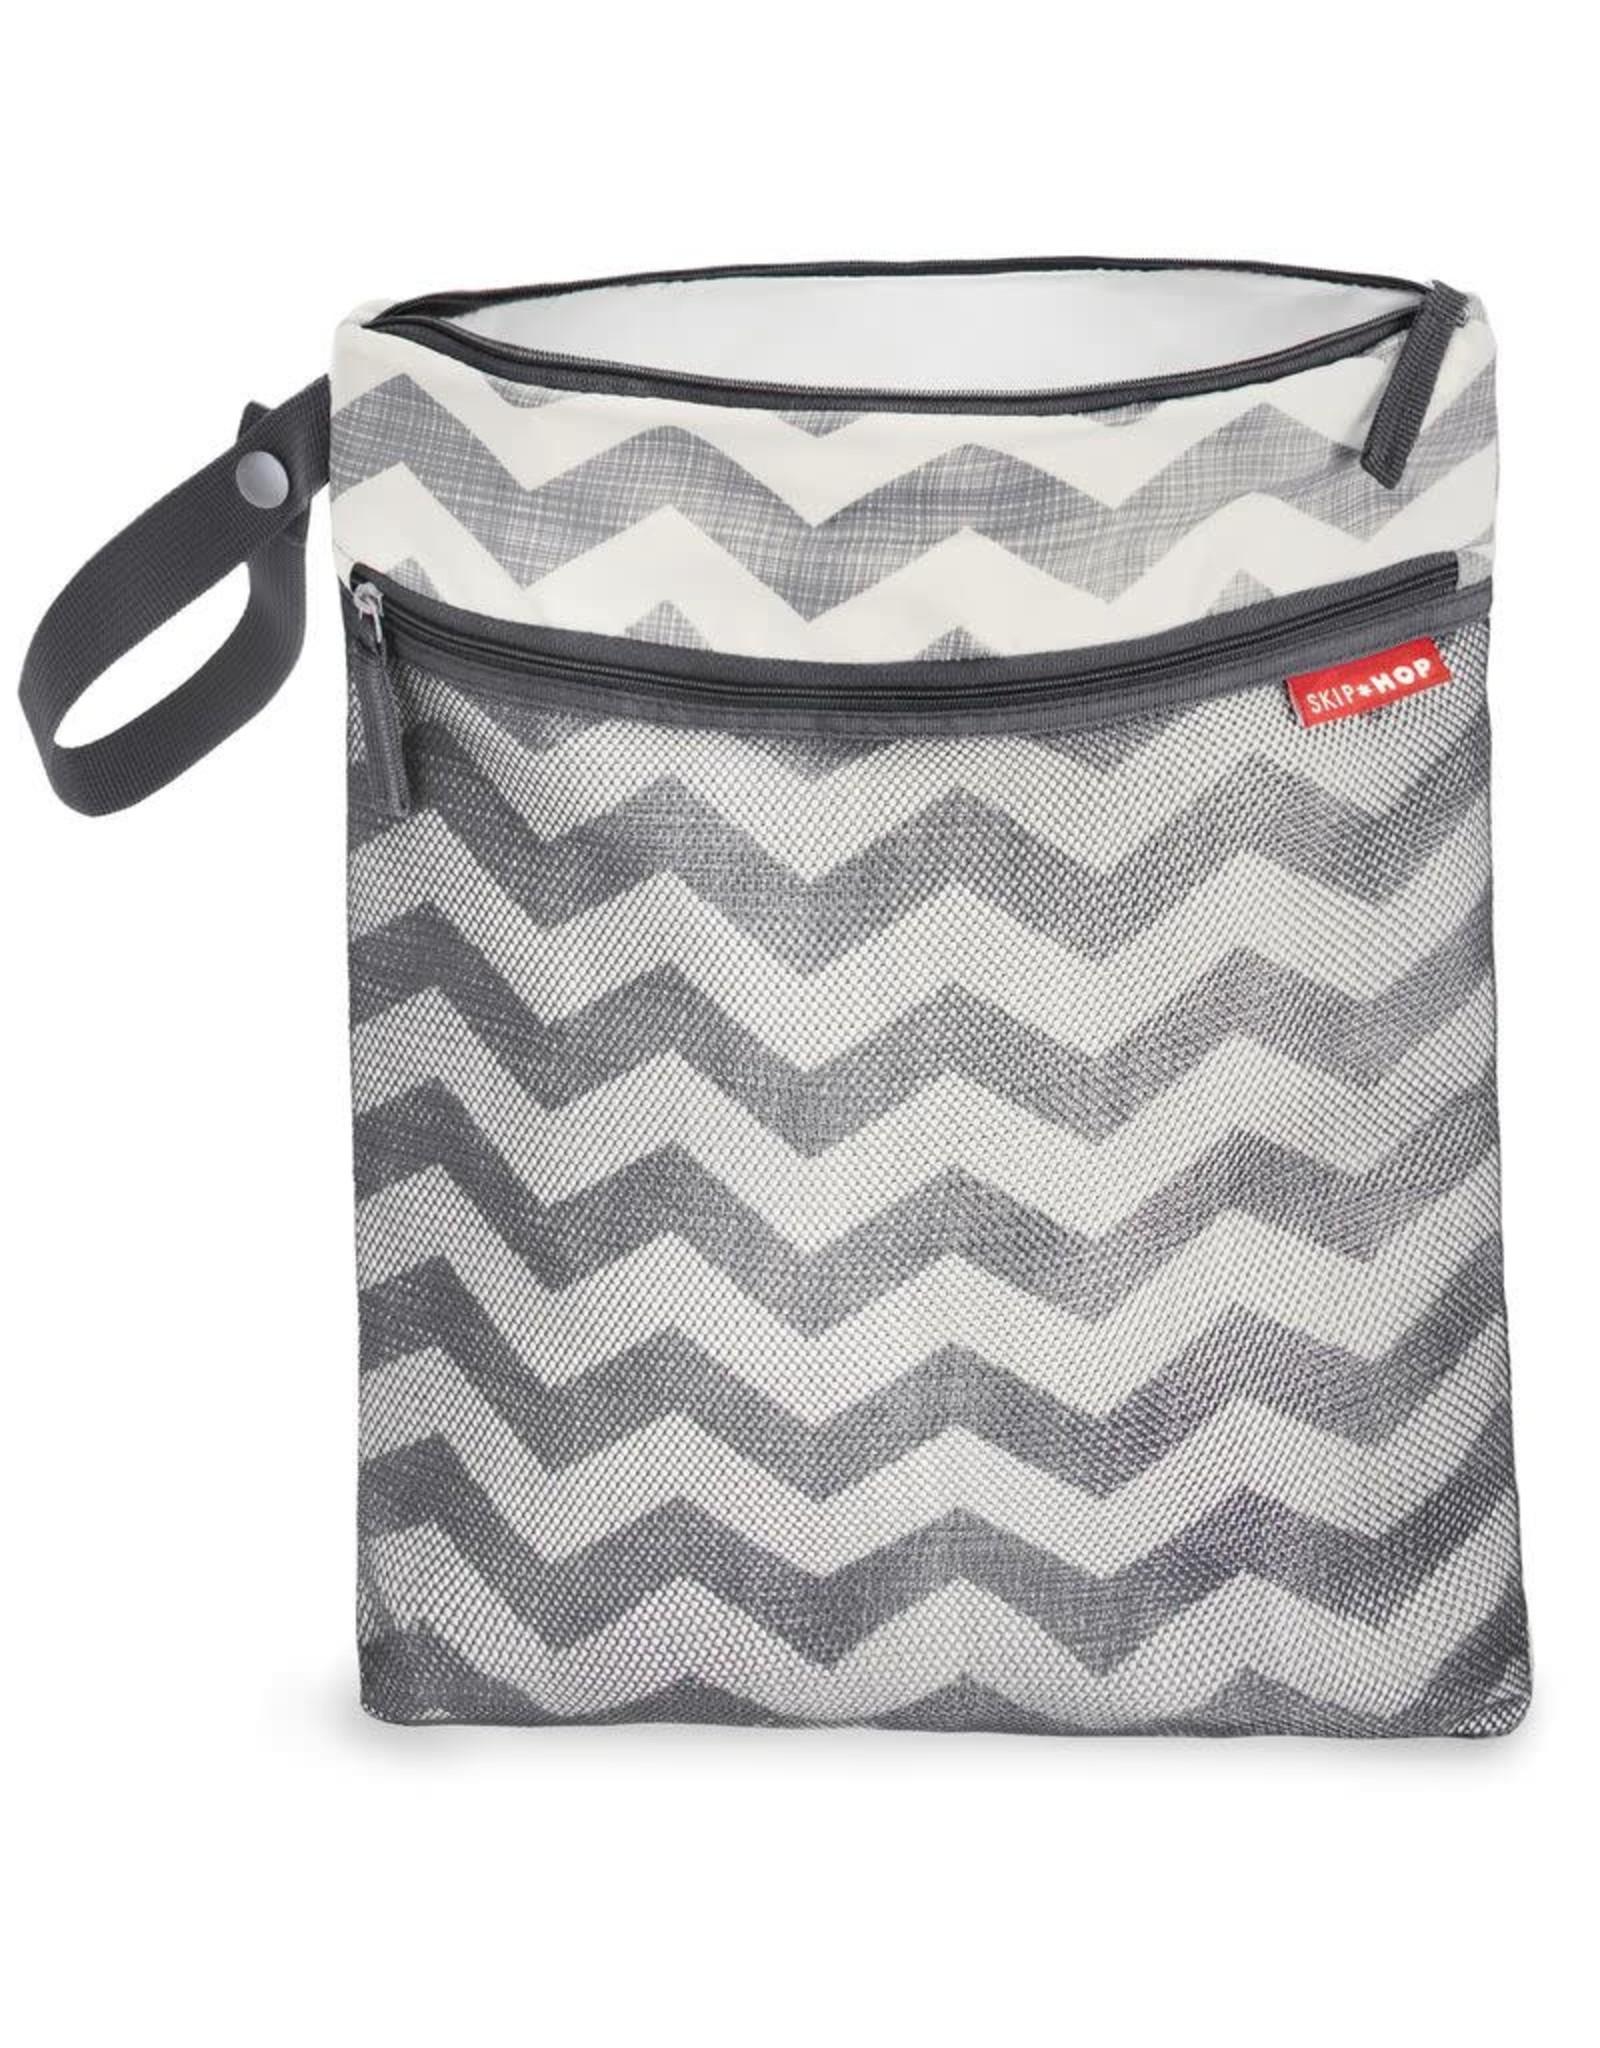 Wet Dry Bag SOLD